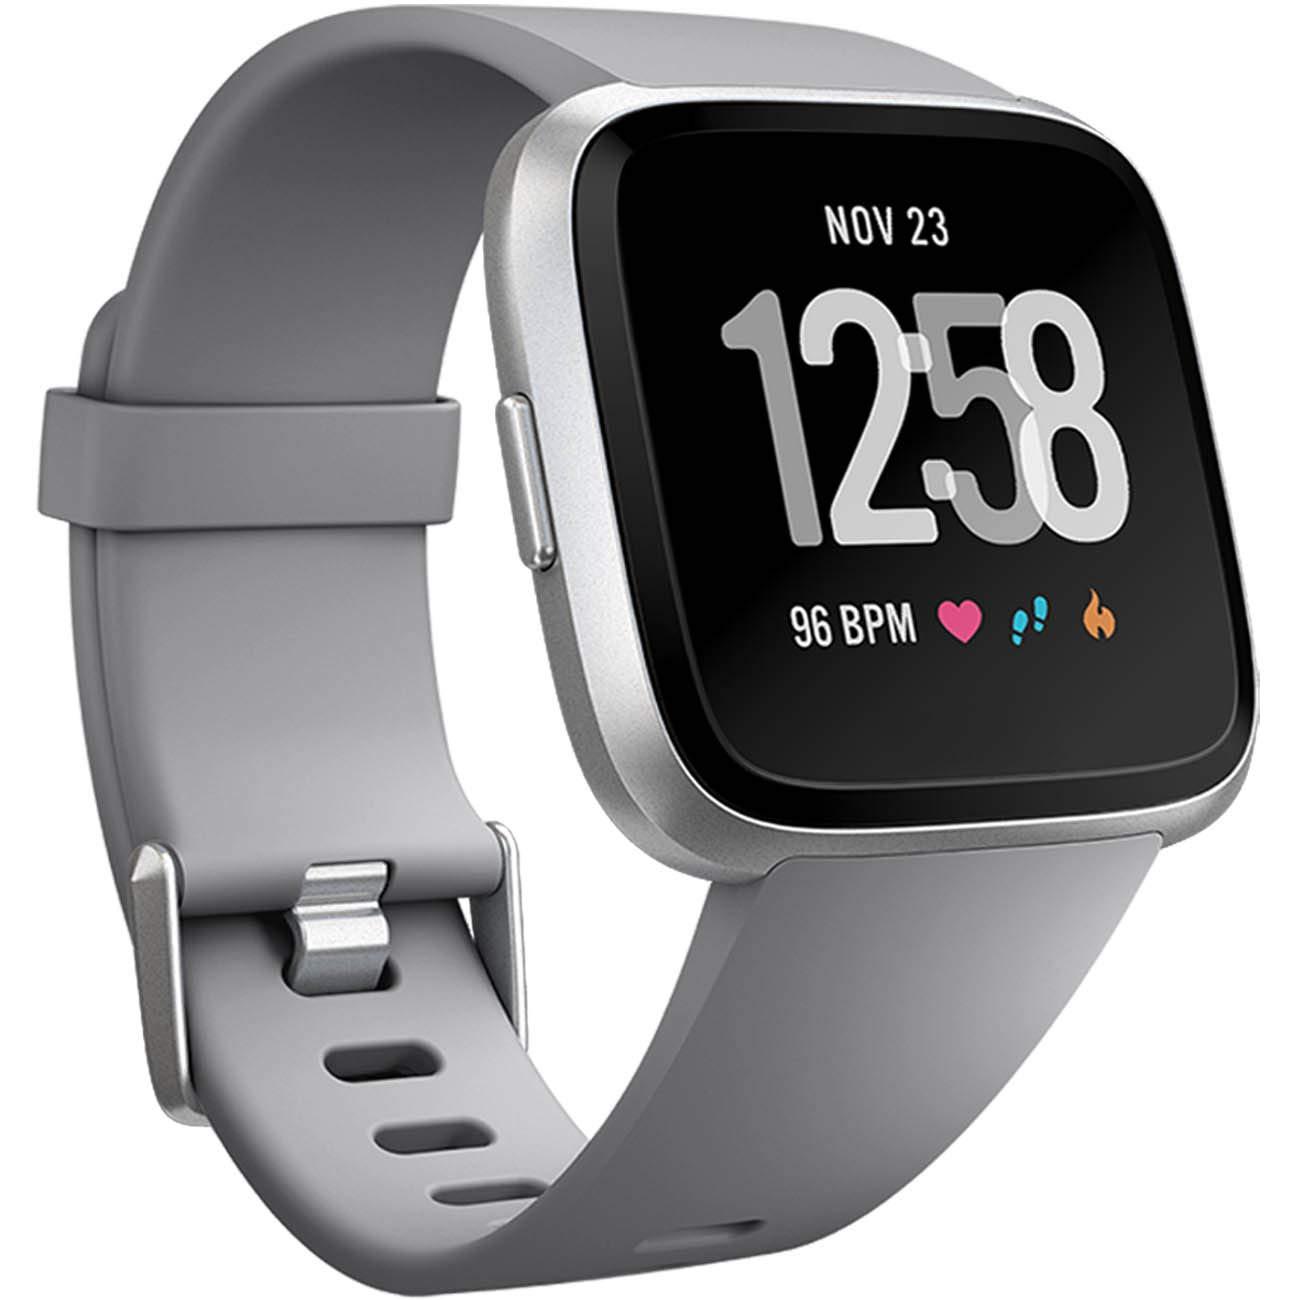 Malla Large para Fitbit Versa / Versa 2 gris -7C9ZL1ZW